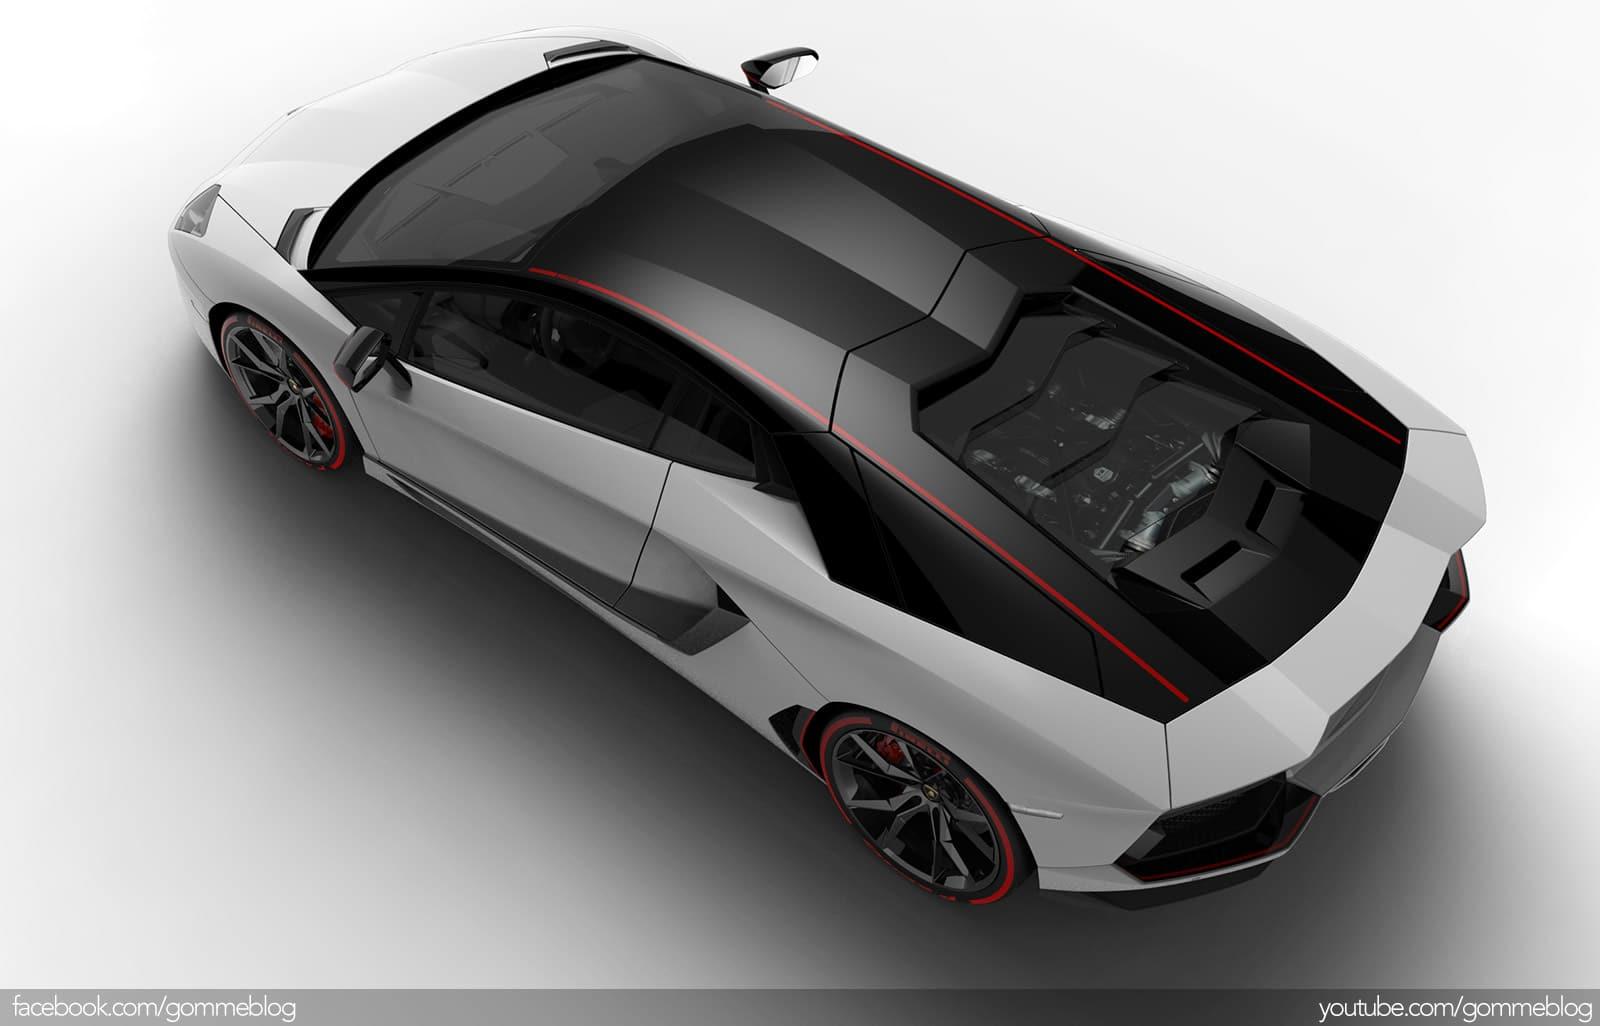 Lamborghini Aventador LP 700-4 Pirelli Edition 2